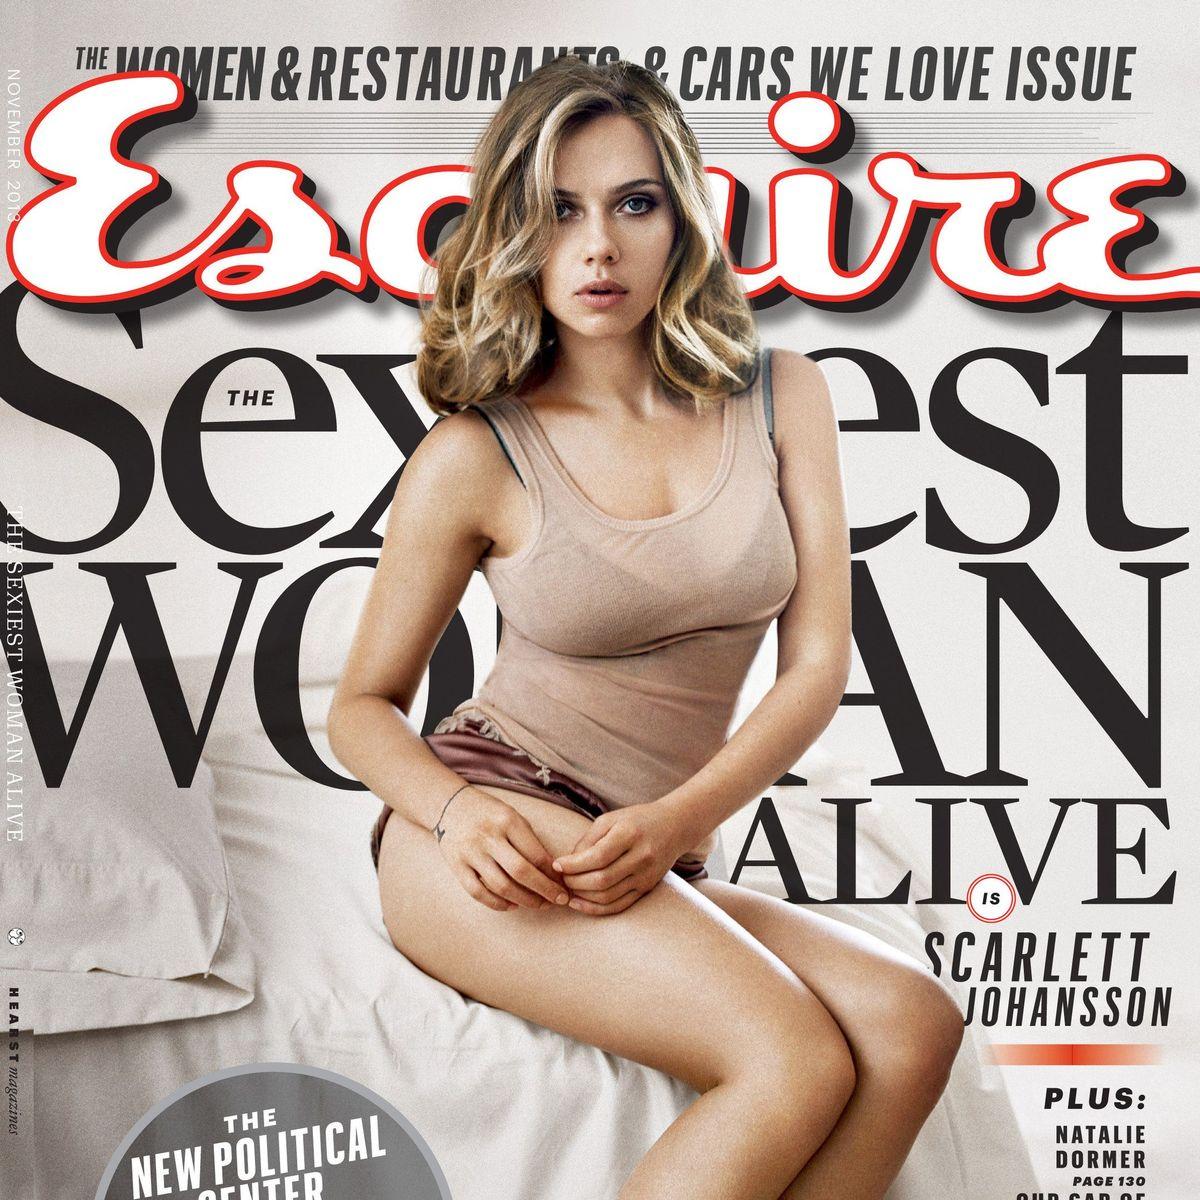 Liste sexiest woman alive Sexiest woman